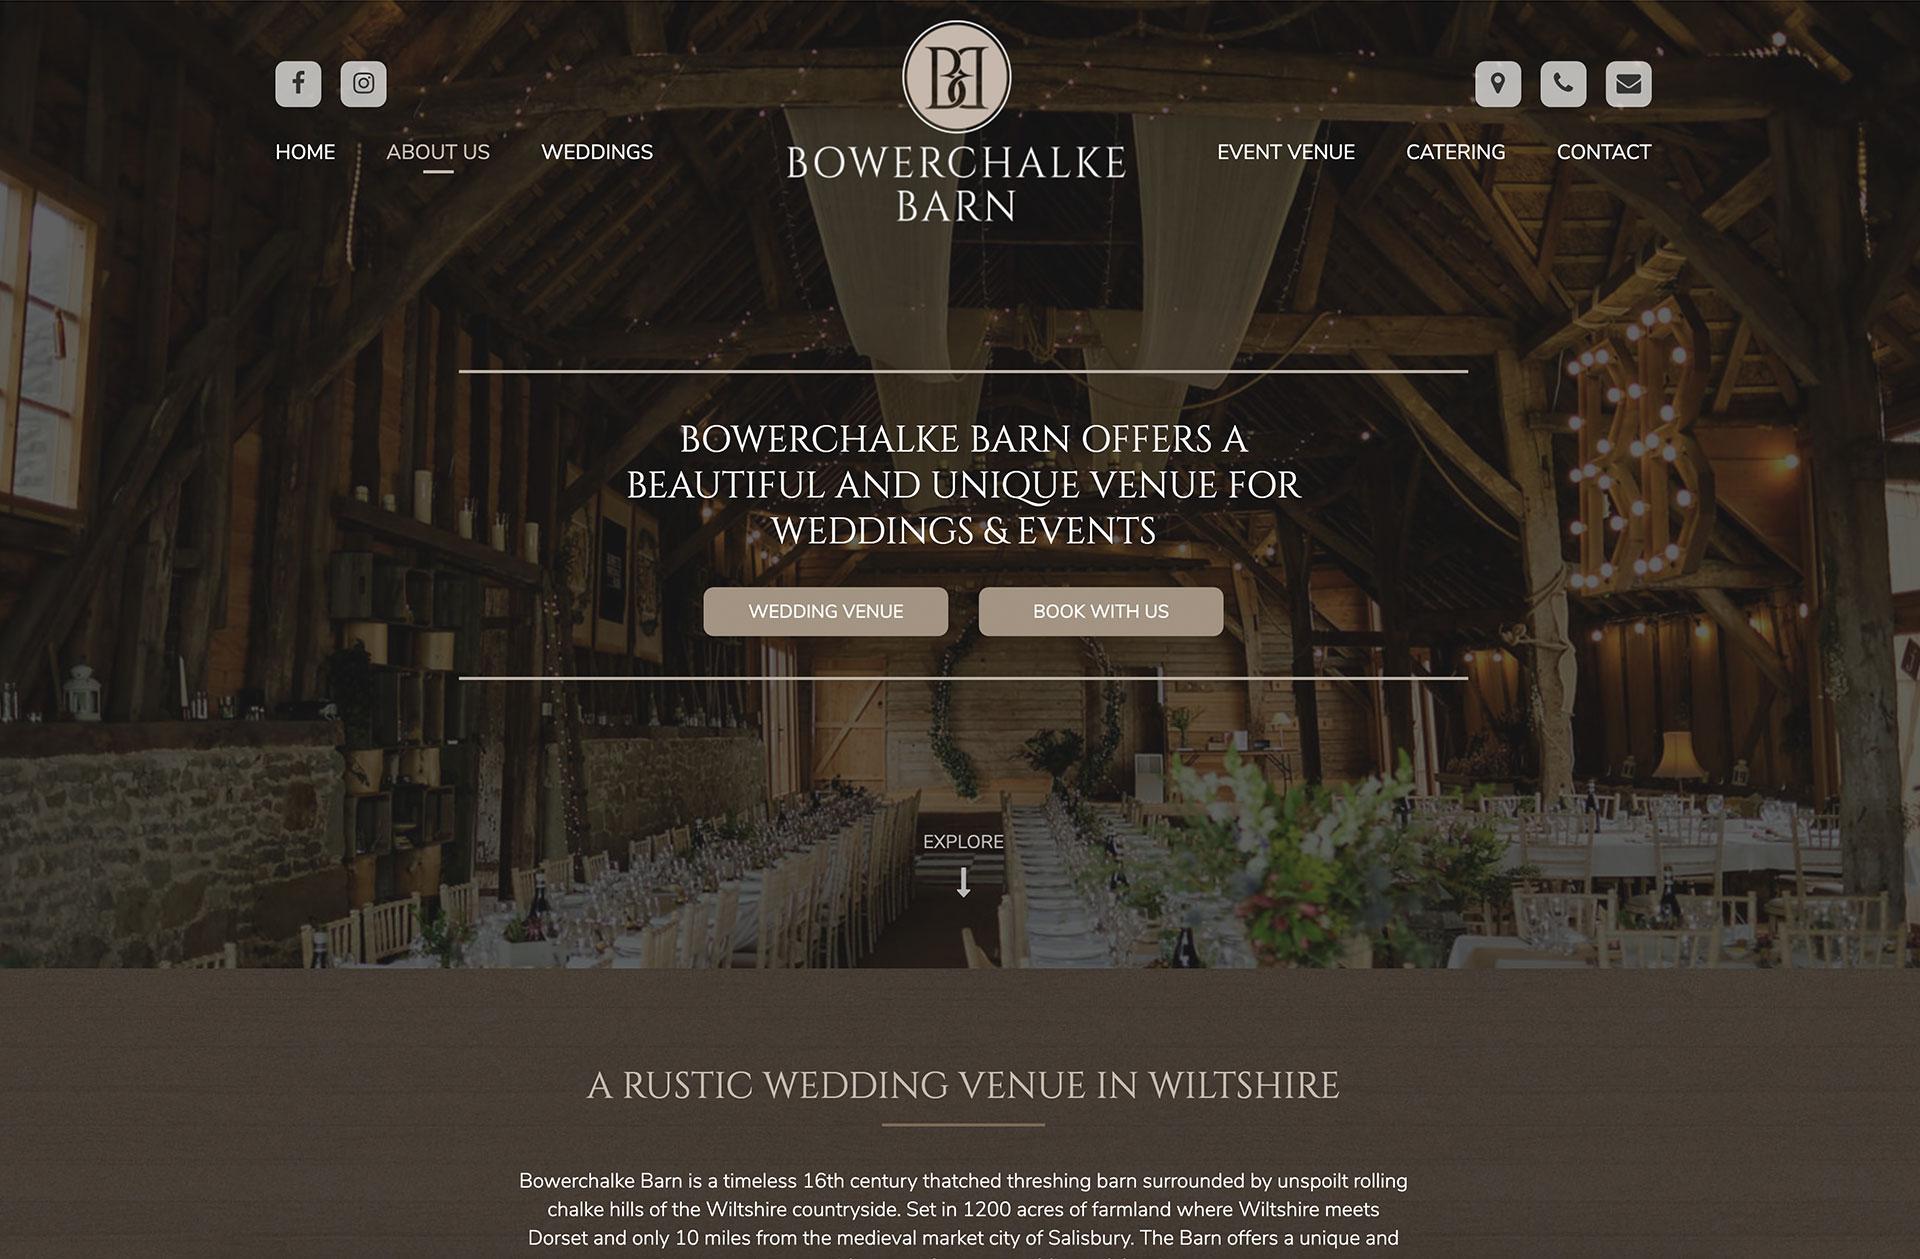 Bowerchalke Barn banner space